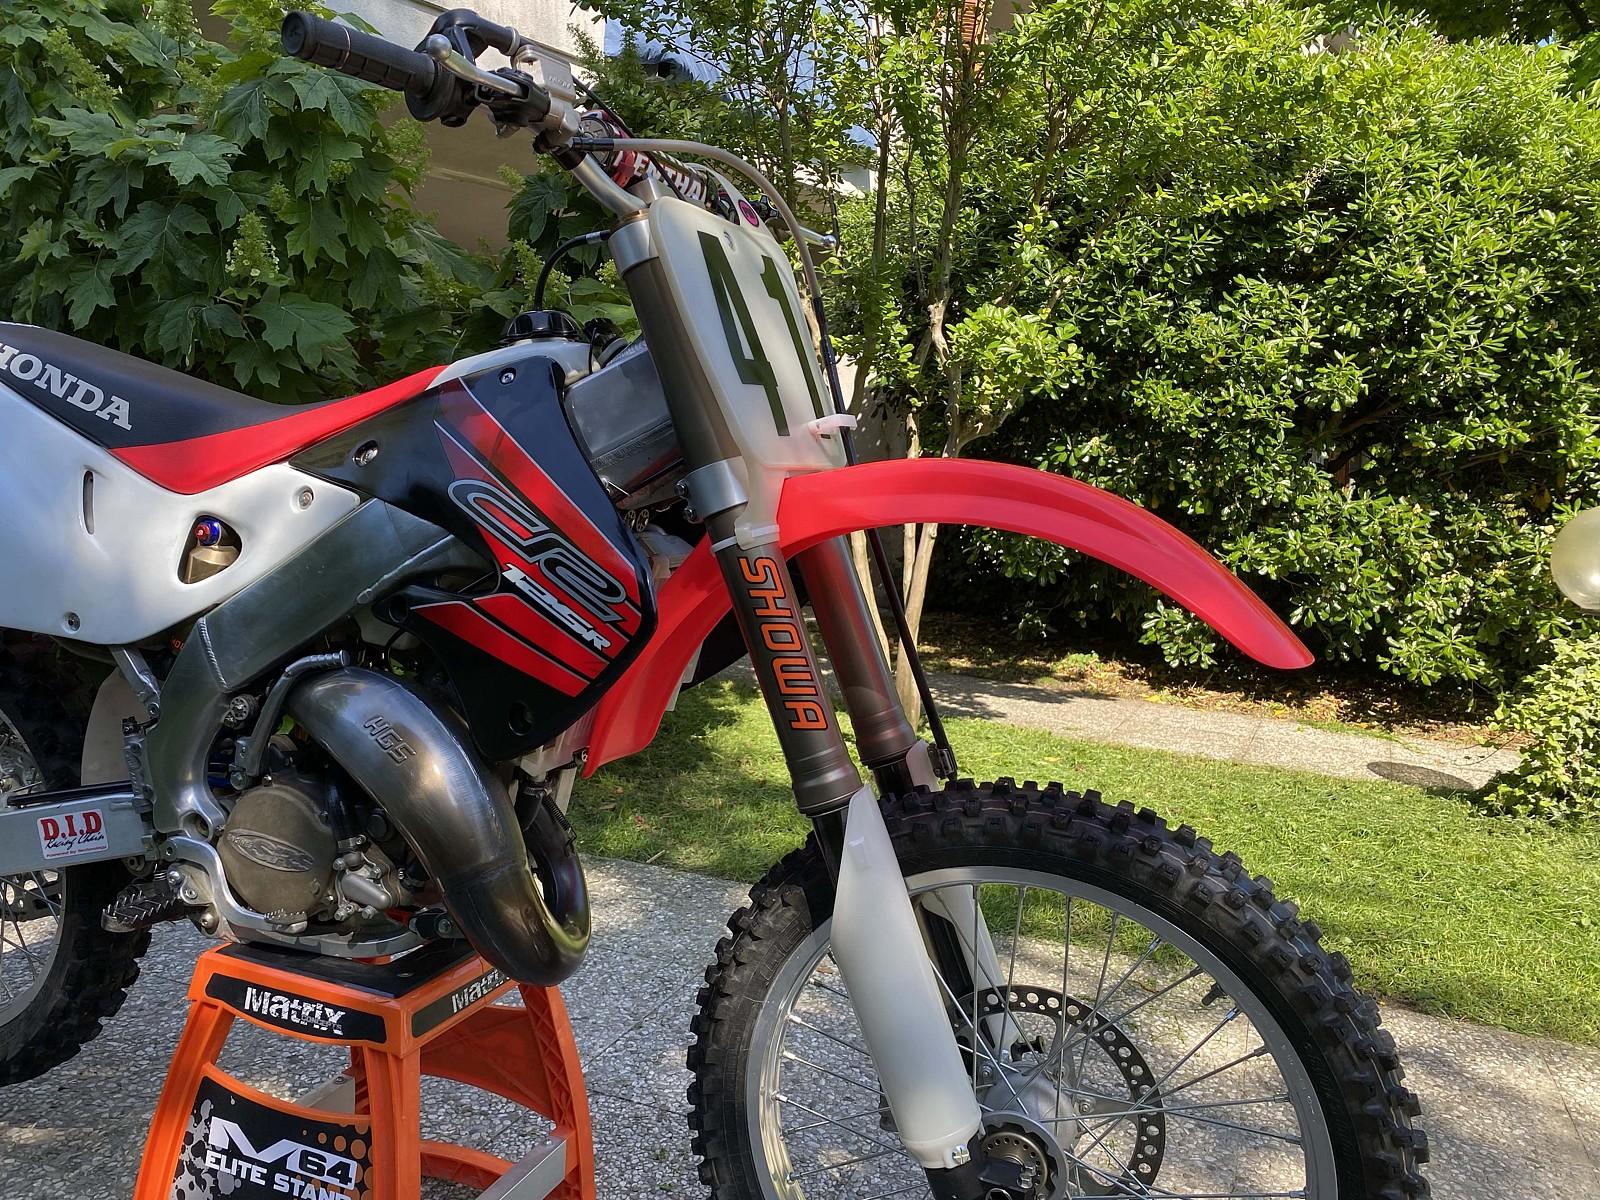 FrHOK - Debegio - Motocross Pictures - Vital MX